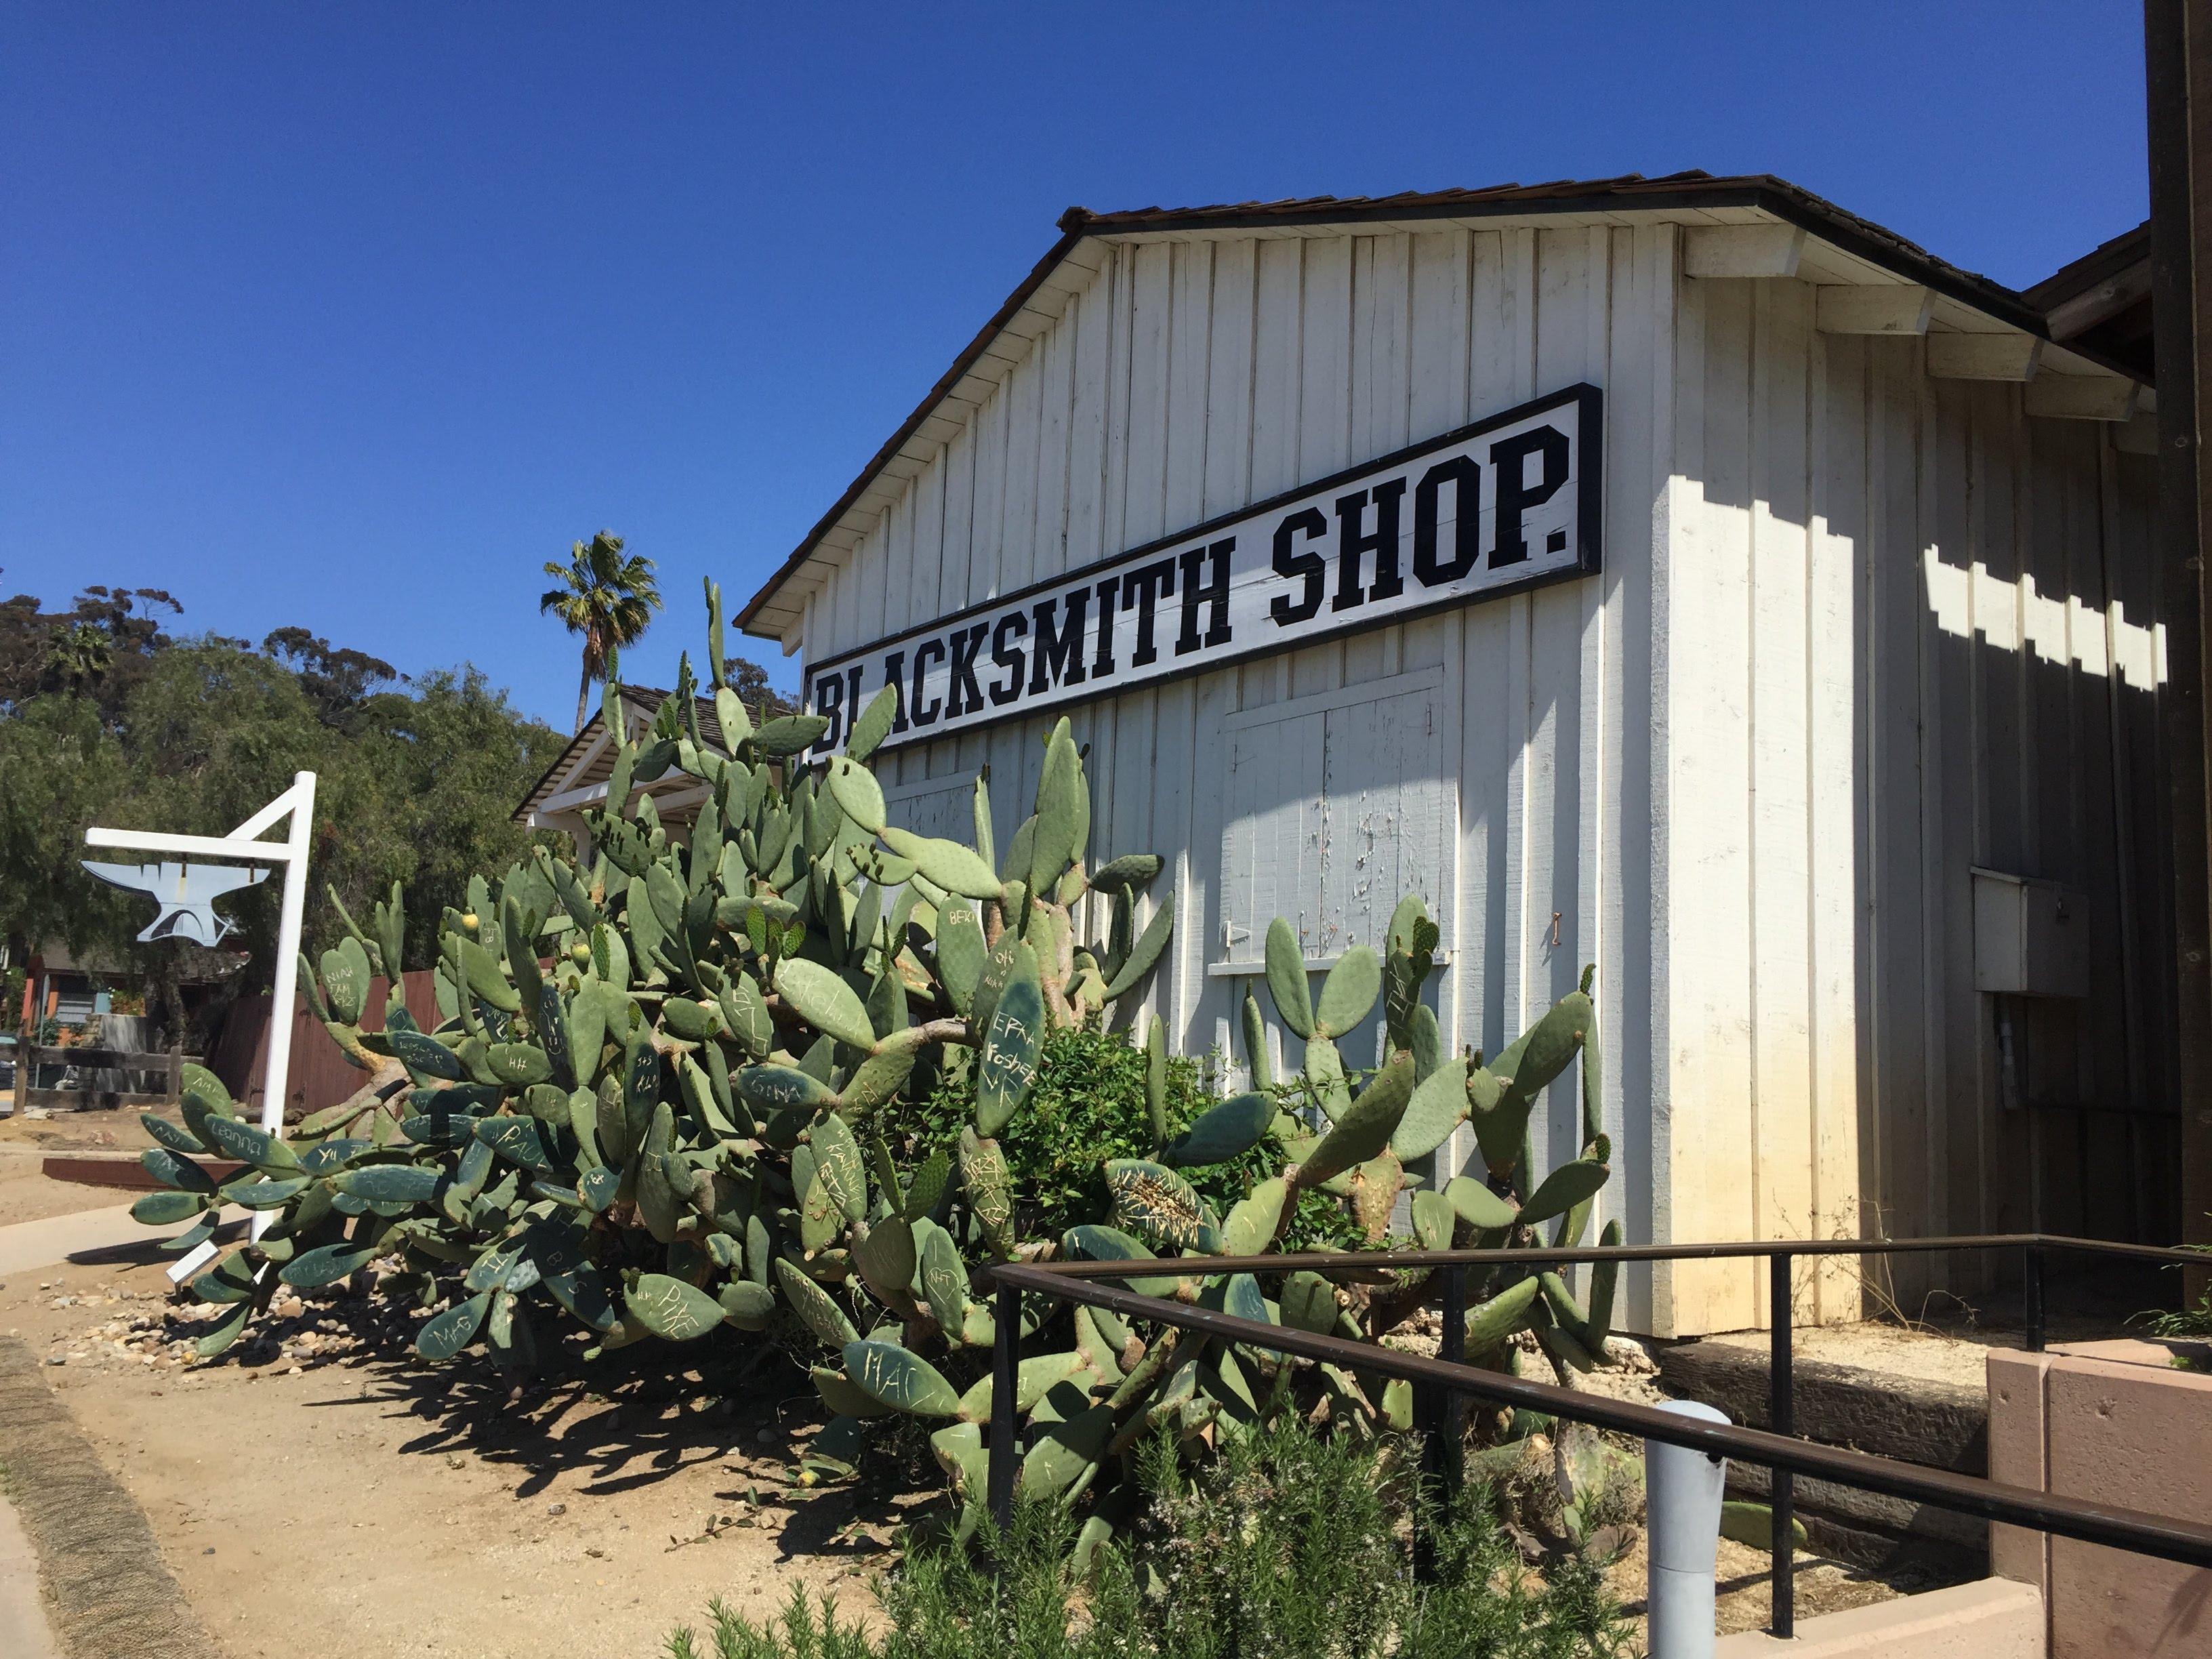 san diego west coast travel ben sam adventures blog ideas cactus